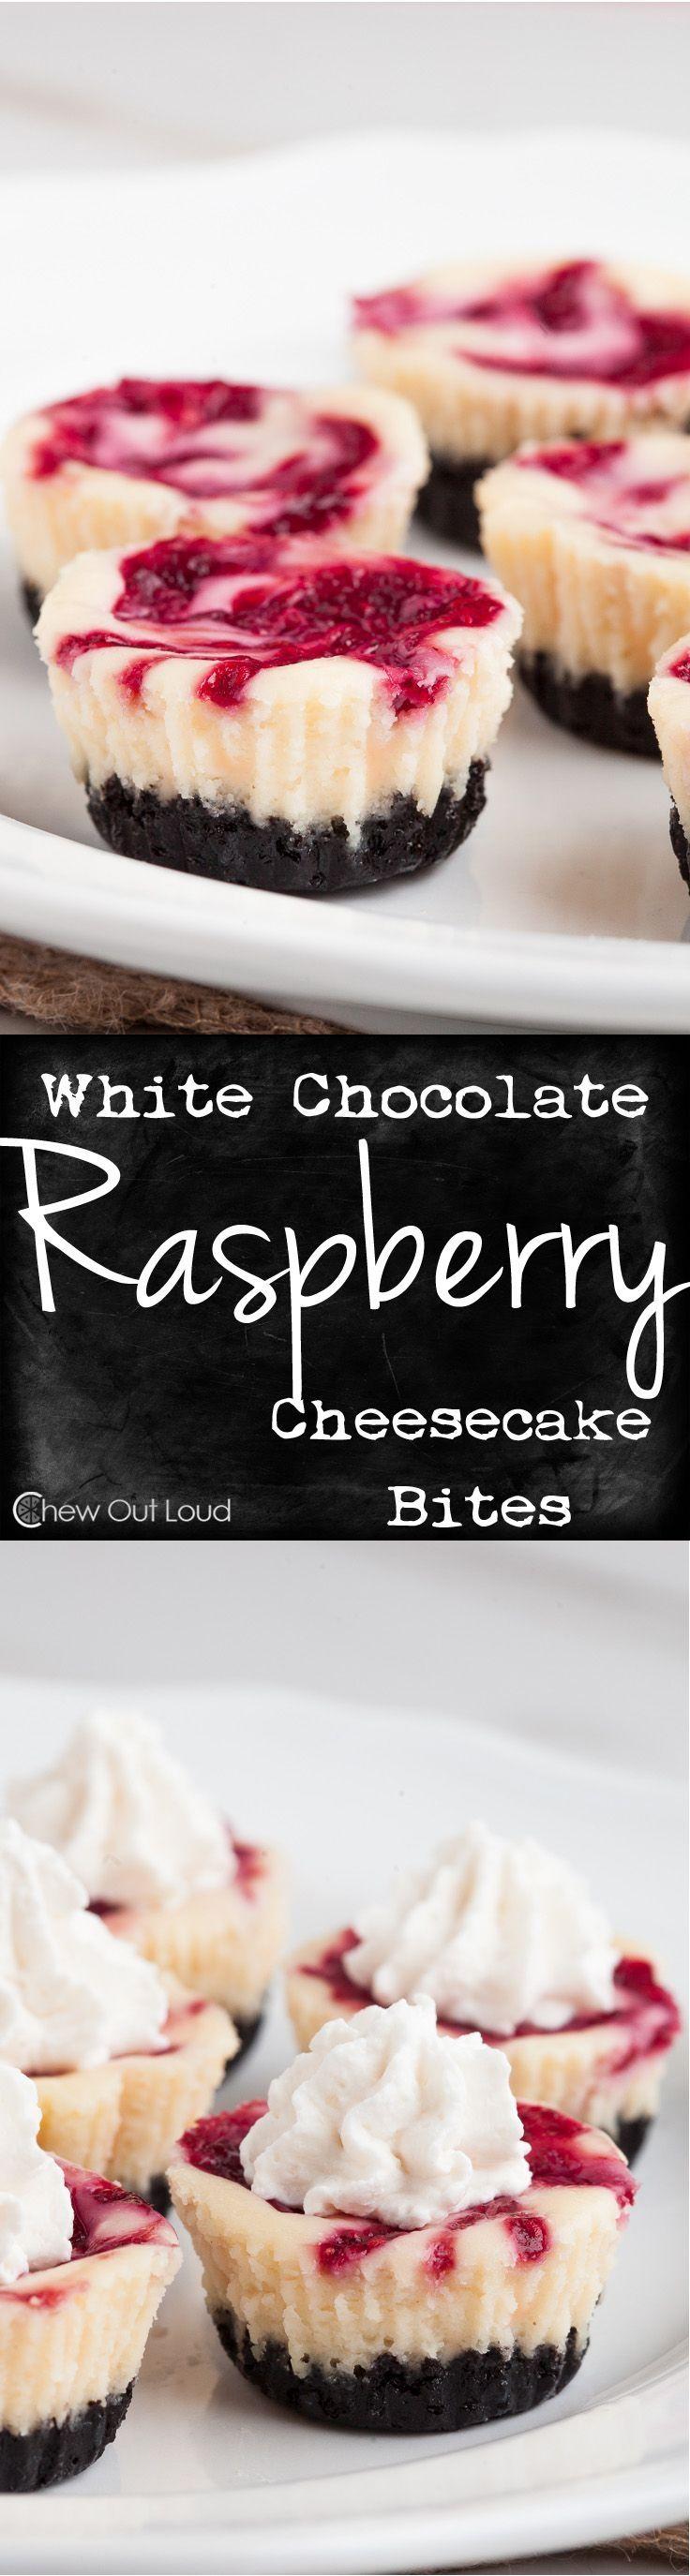 White Chocolate Raspberry Cheesecakes Bites | #Bites #Cheesecakes #chocolate…